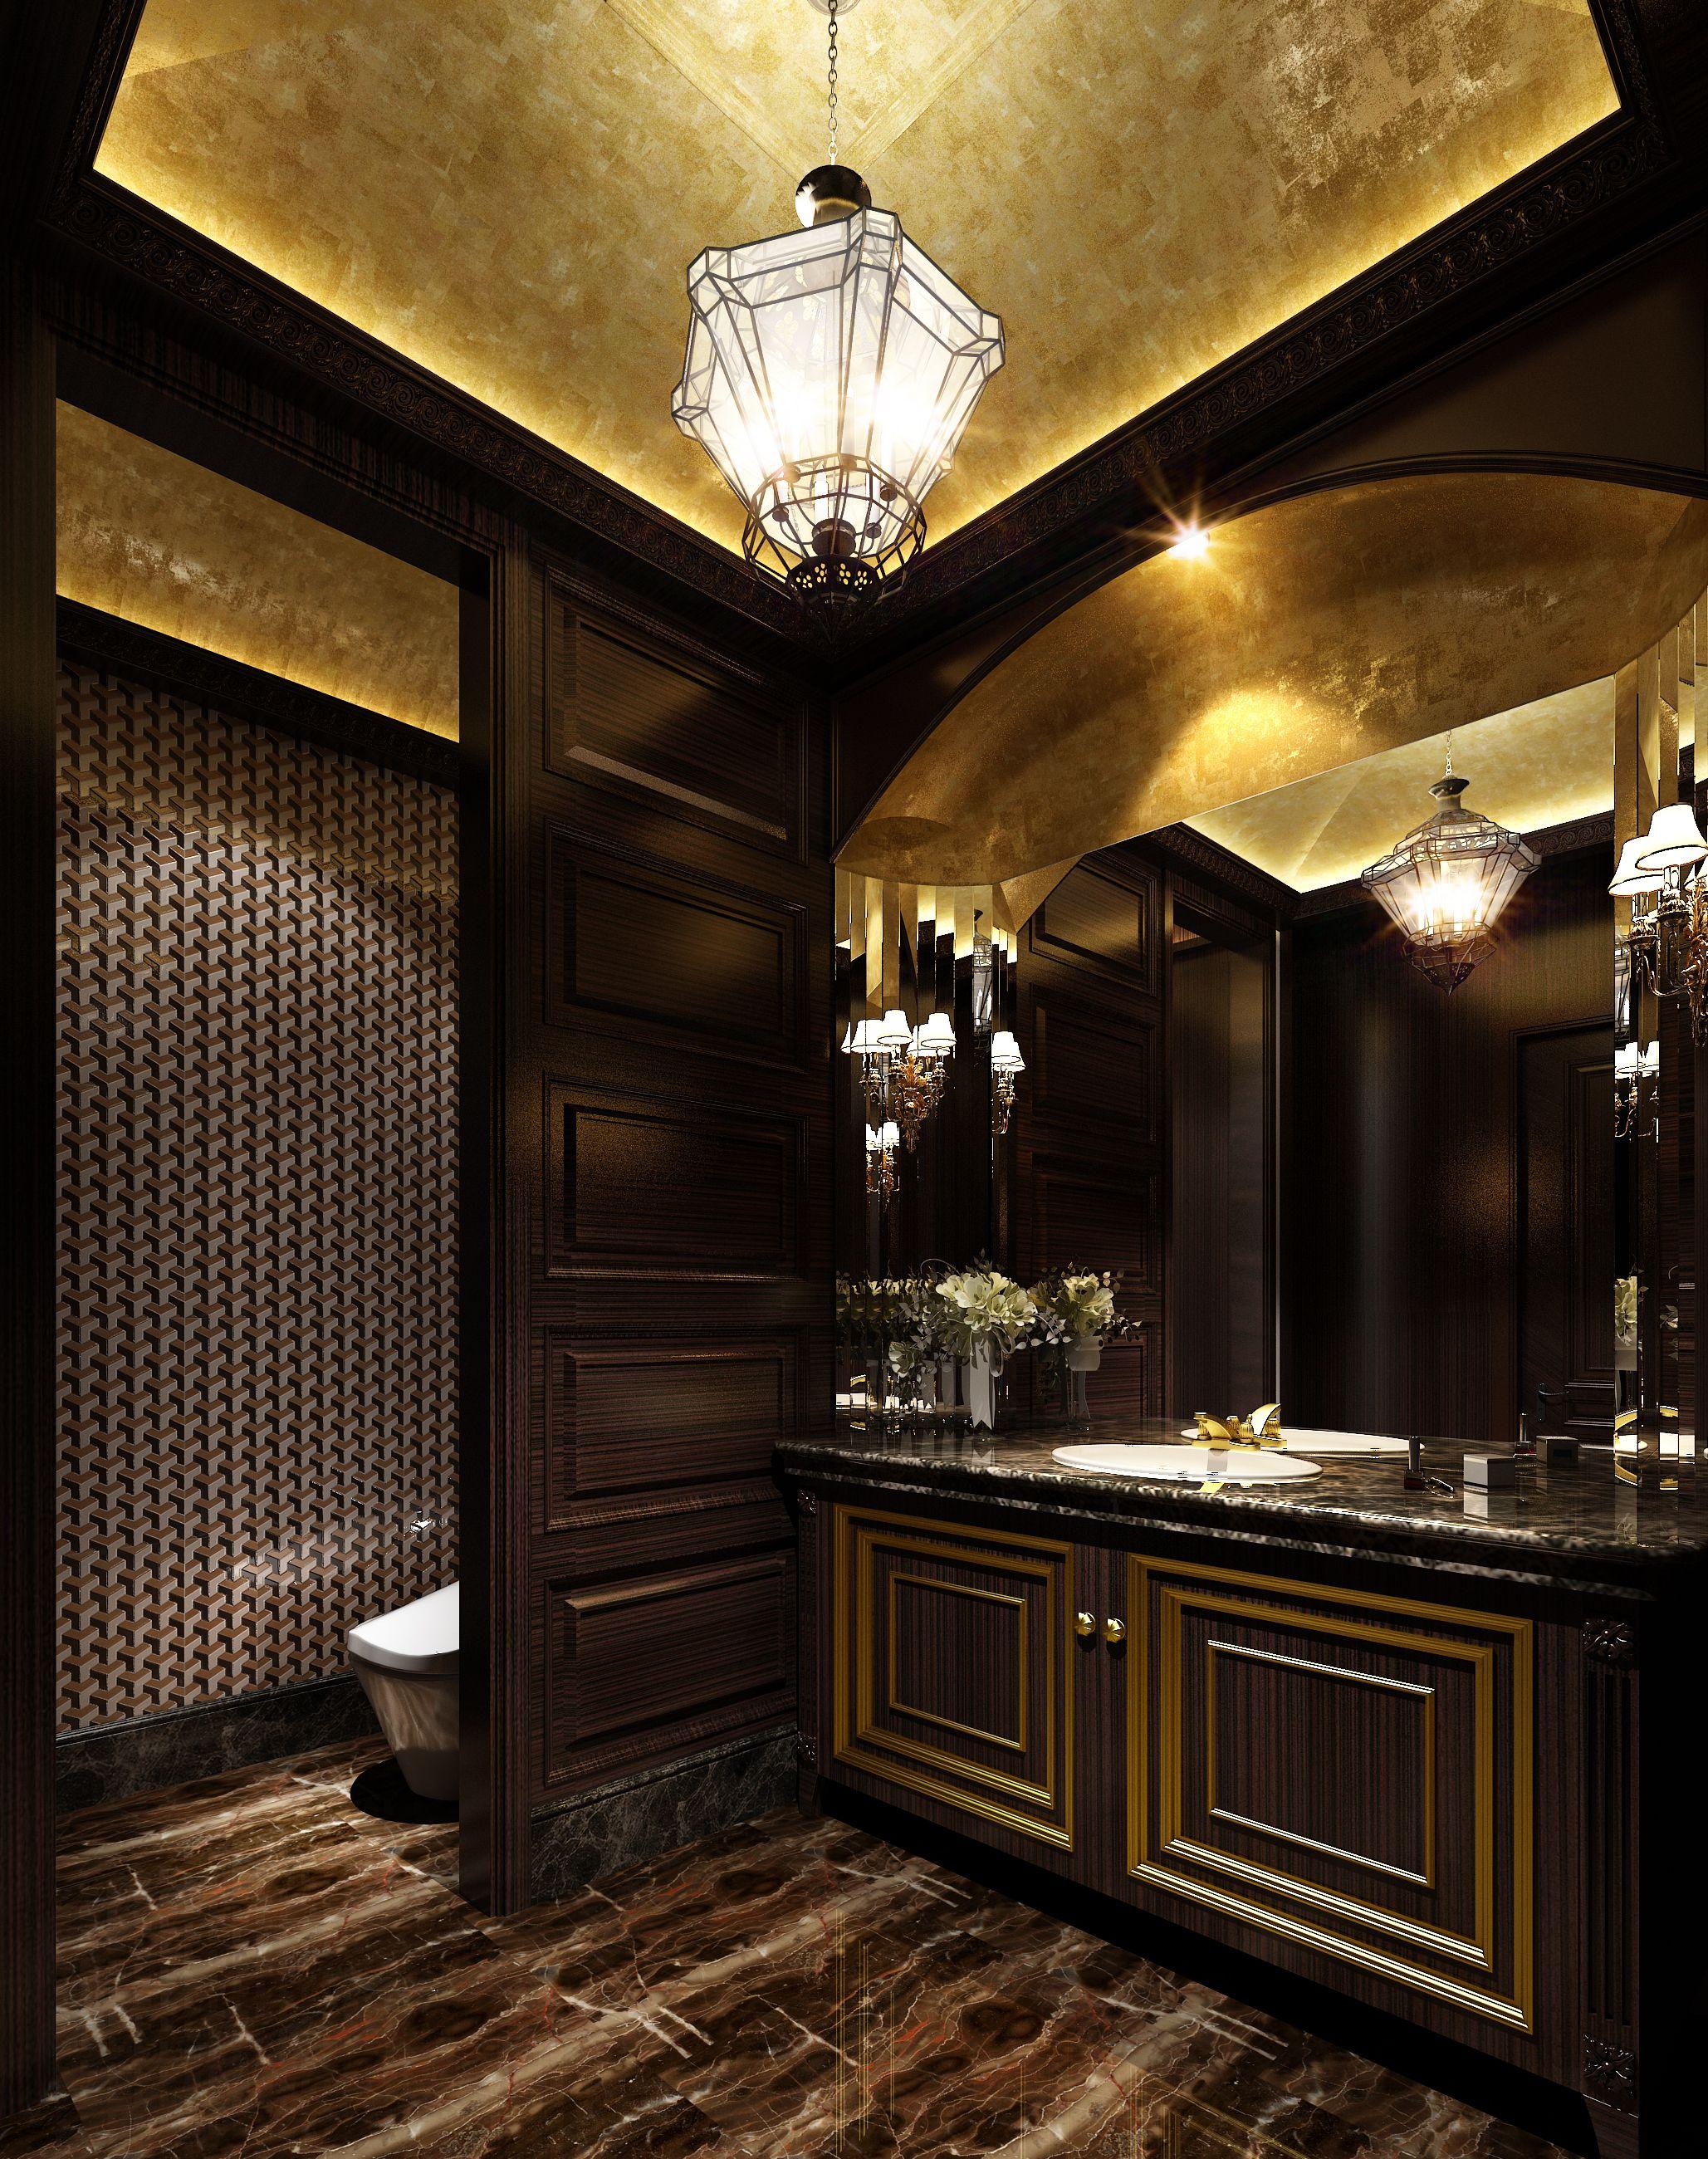 Luxury Marble Bathrooms dark marble floors | luxurious dark bathroom with marble floor 3d